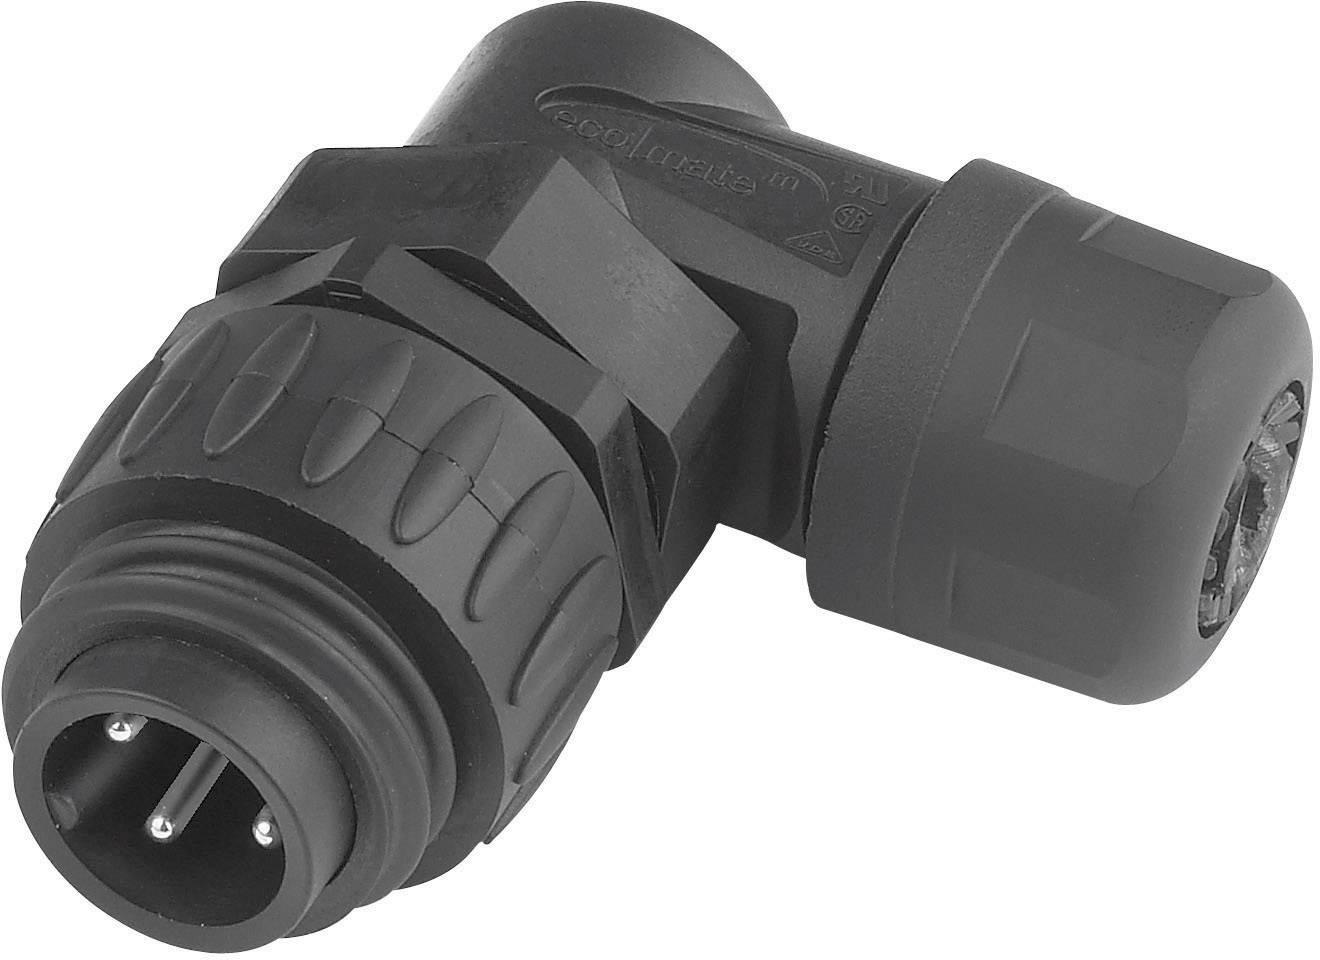 Kabelový konektor 6+PE Amphenol C016 30K006 100 12, černá